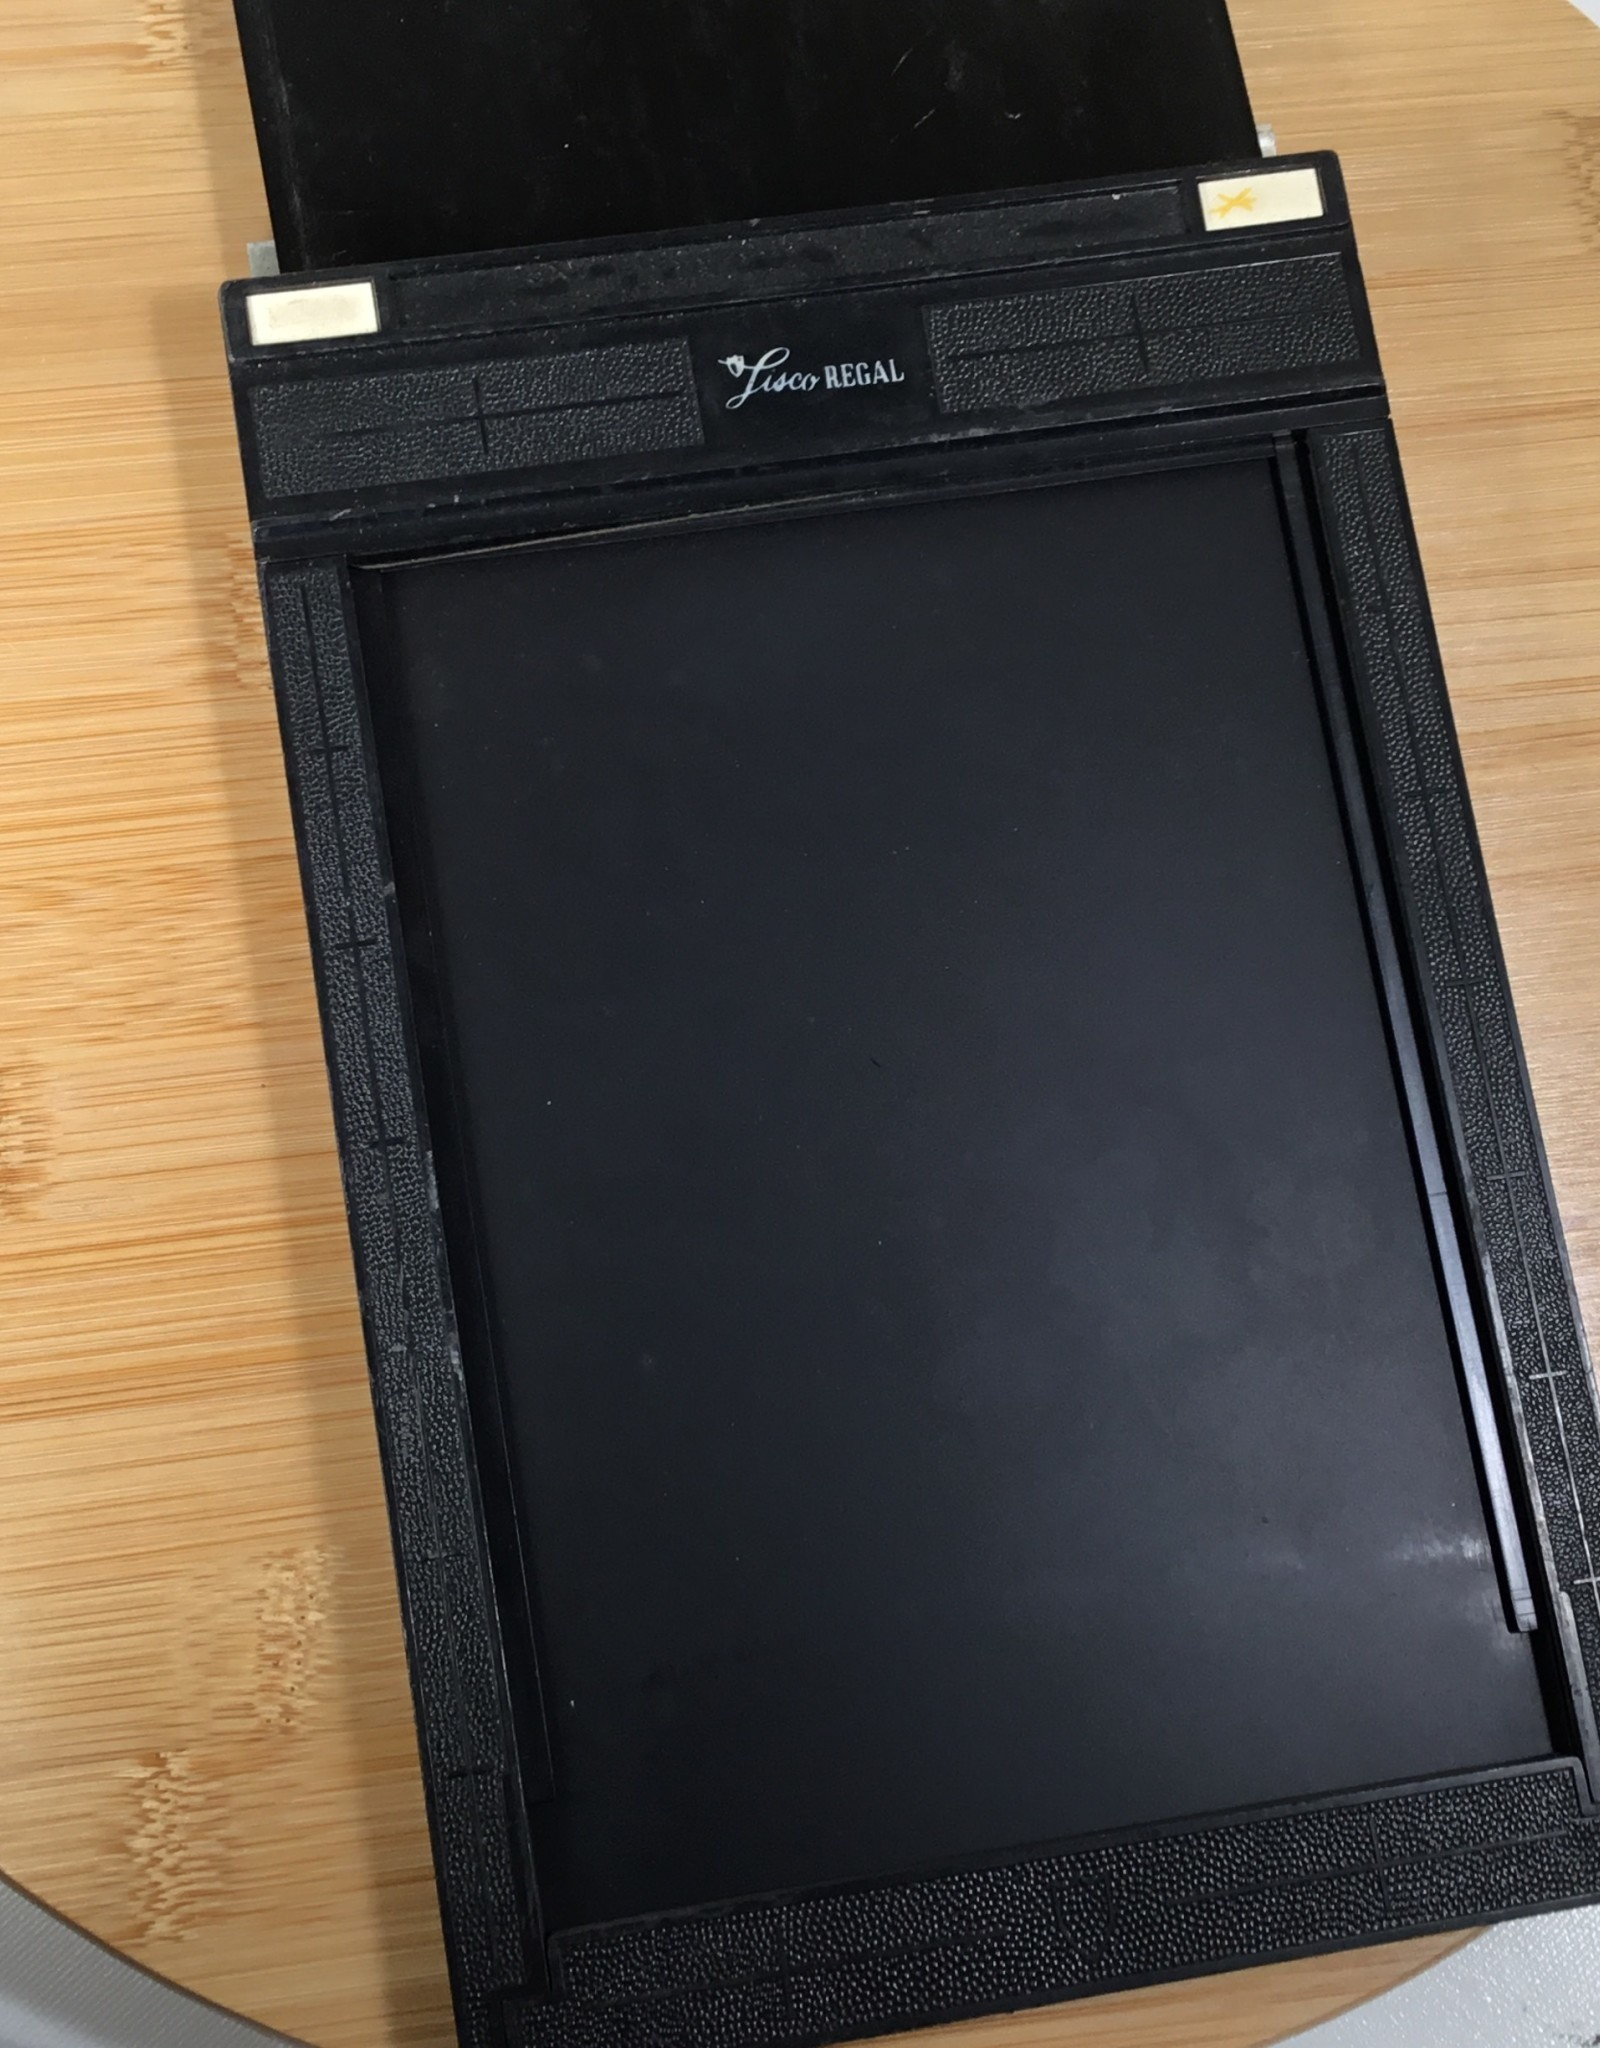 Lisco Regal Lisco Regal 5x7 Sheet Film Holder Used EX